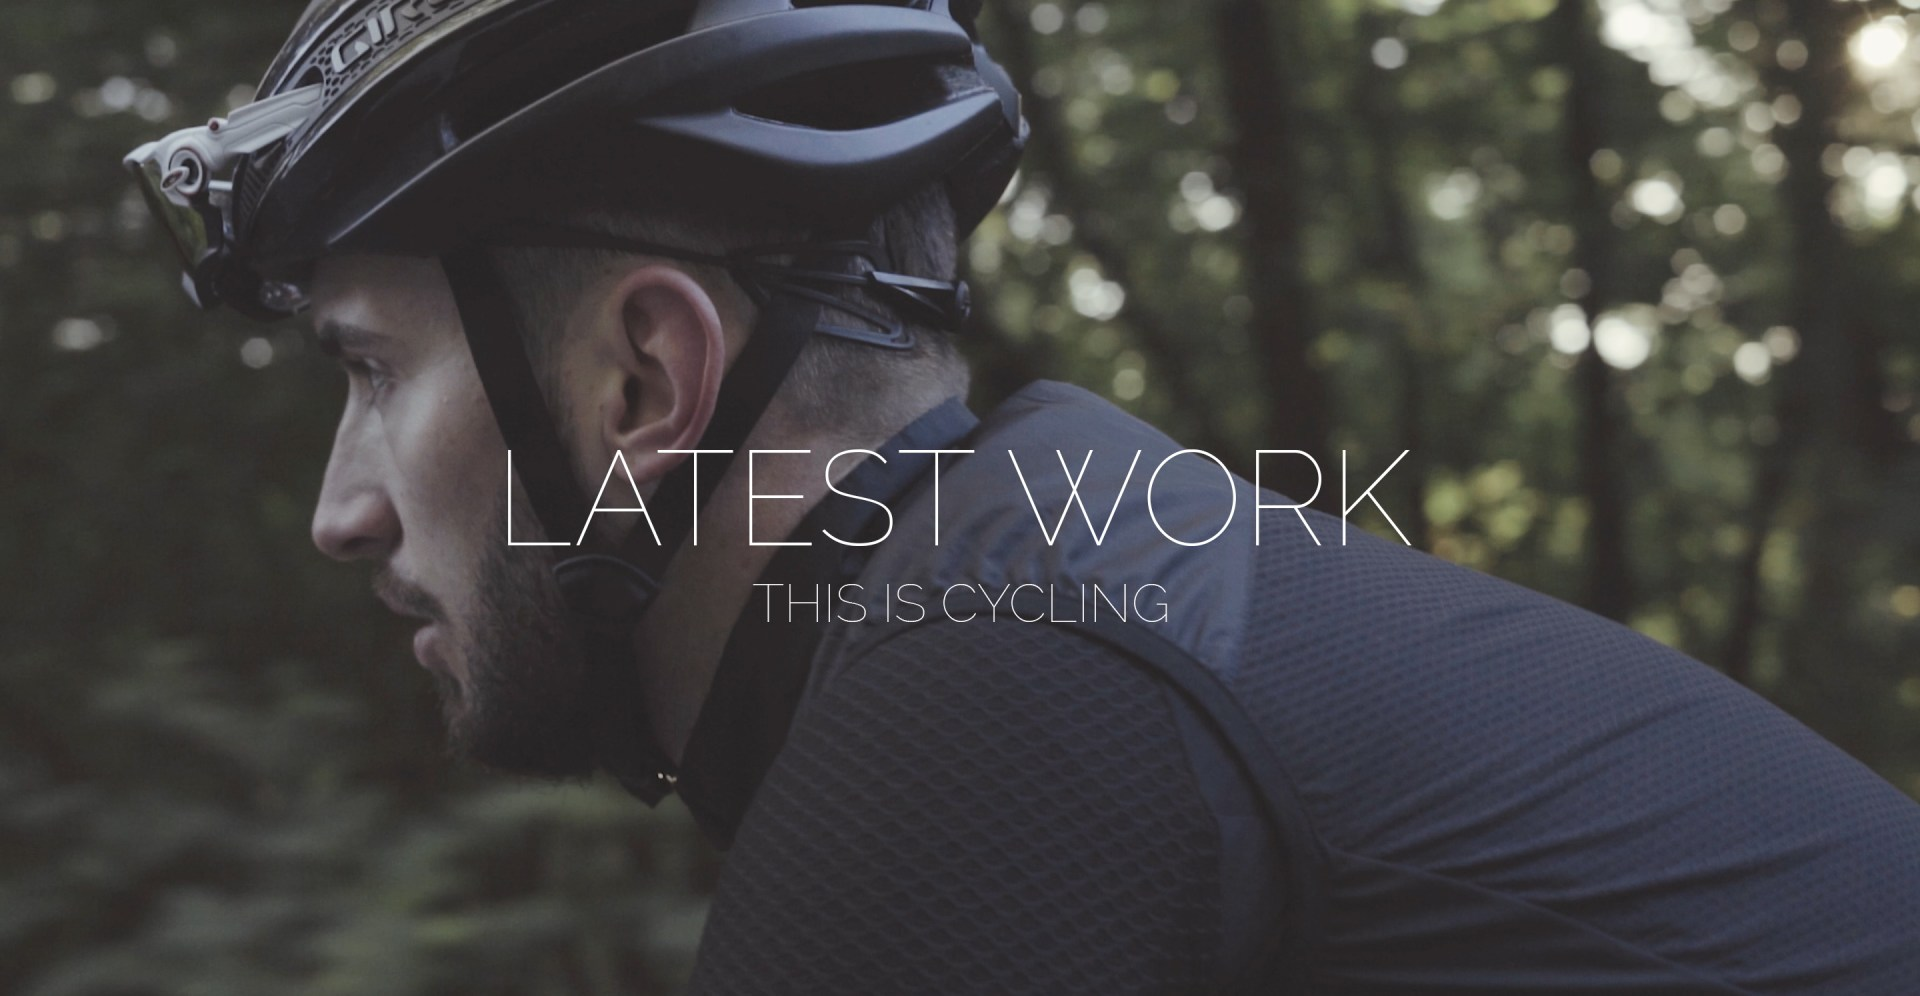 Fingerscrossed.Design, Inspired by, Video, Rennradblog, Radblog, Video, Vlog, Austria, This is cycling, Geradeaus.at